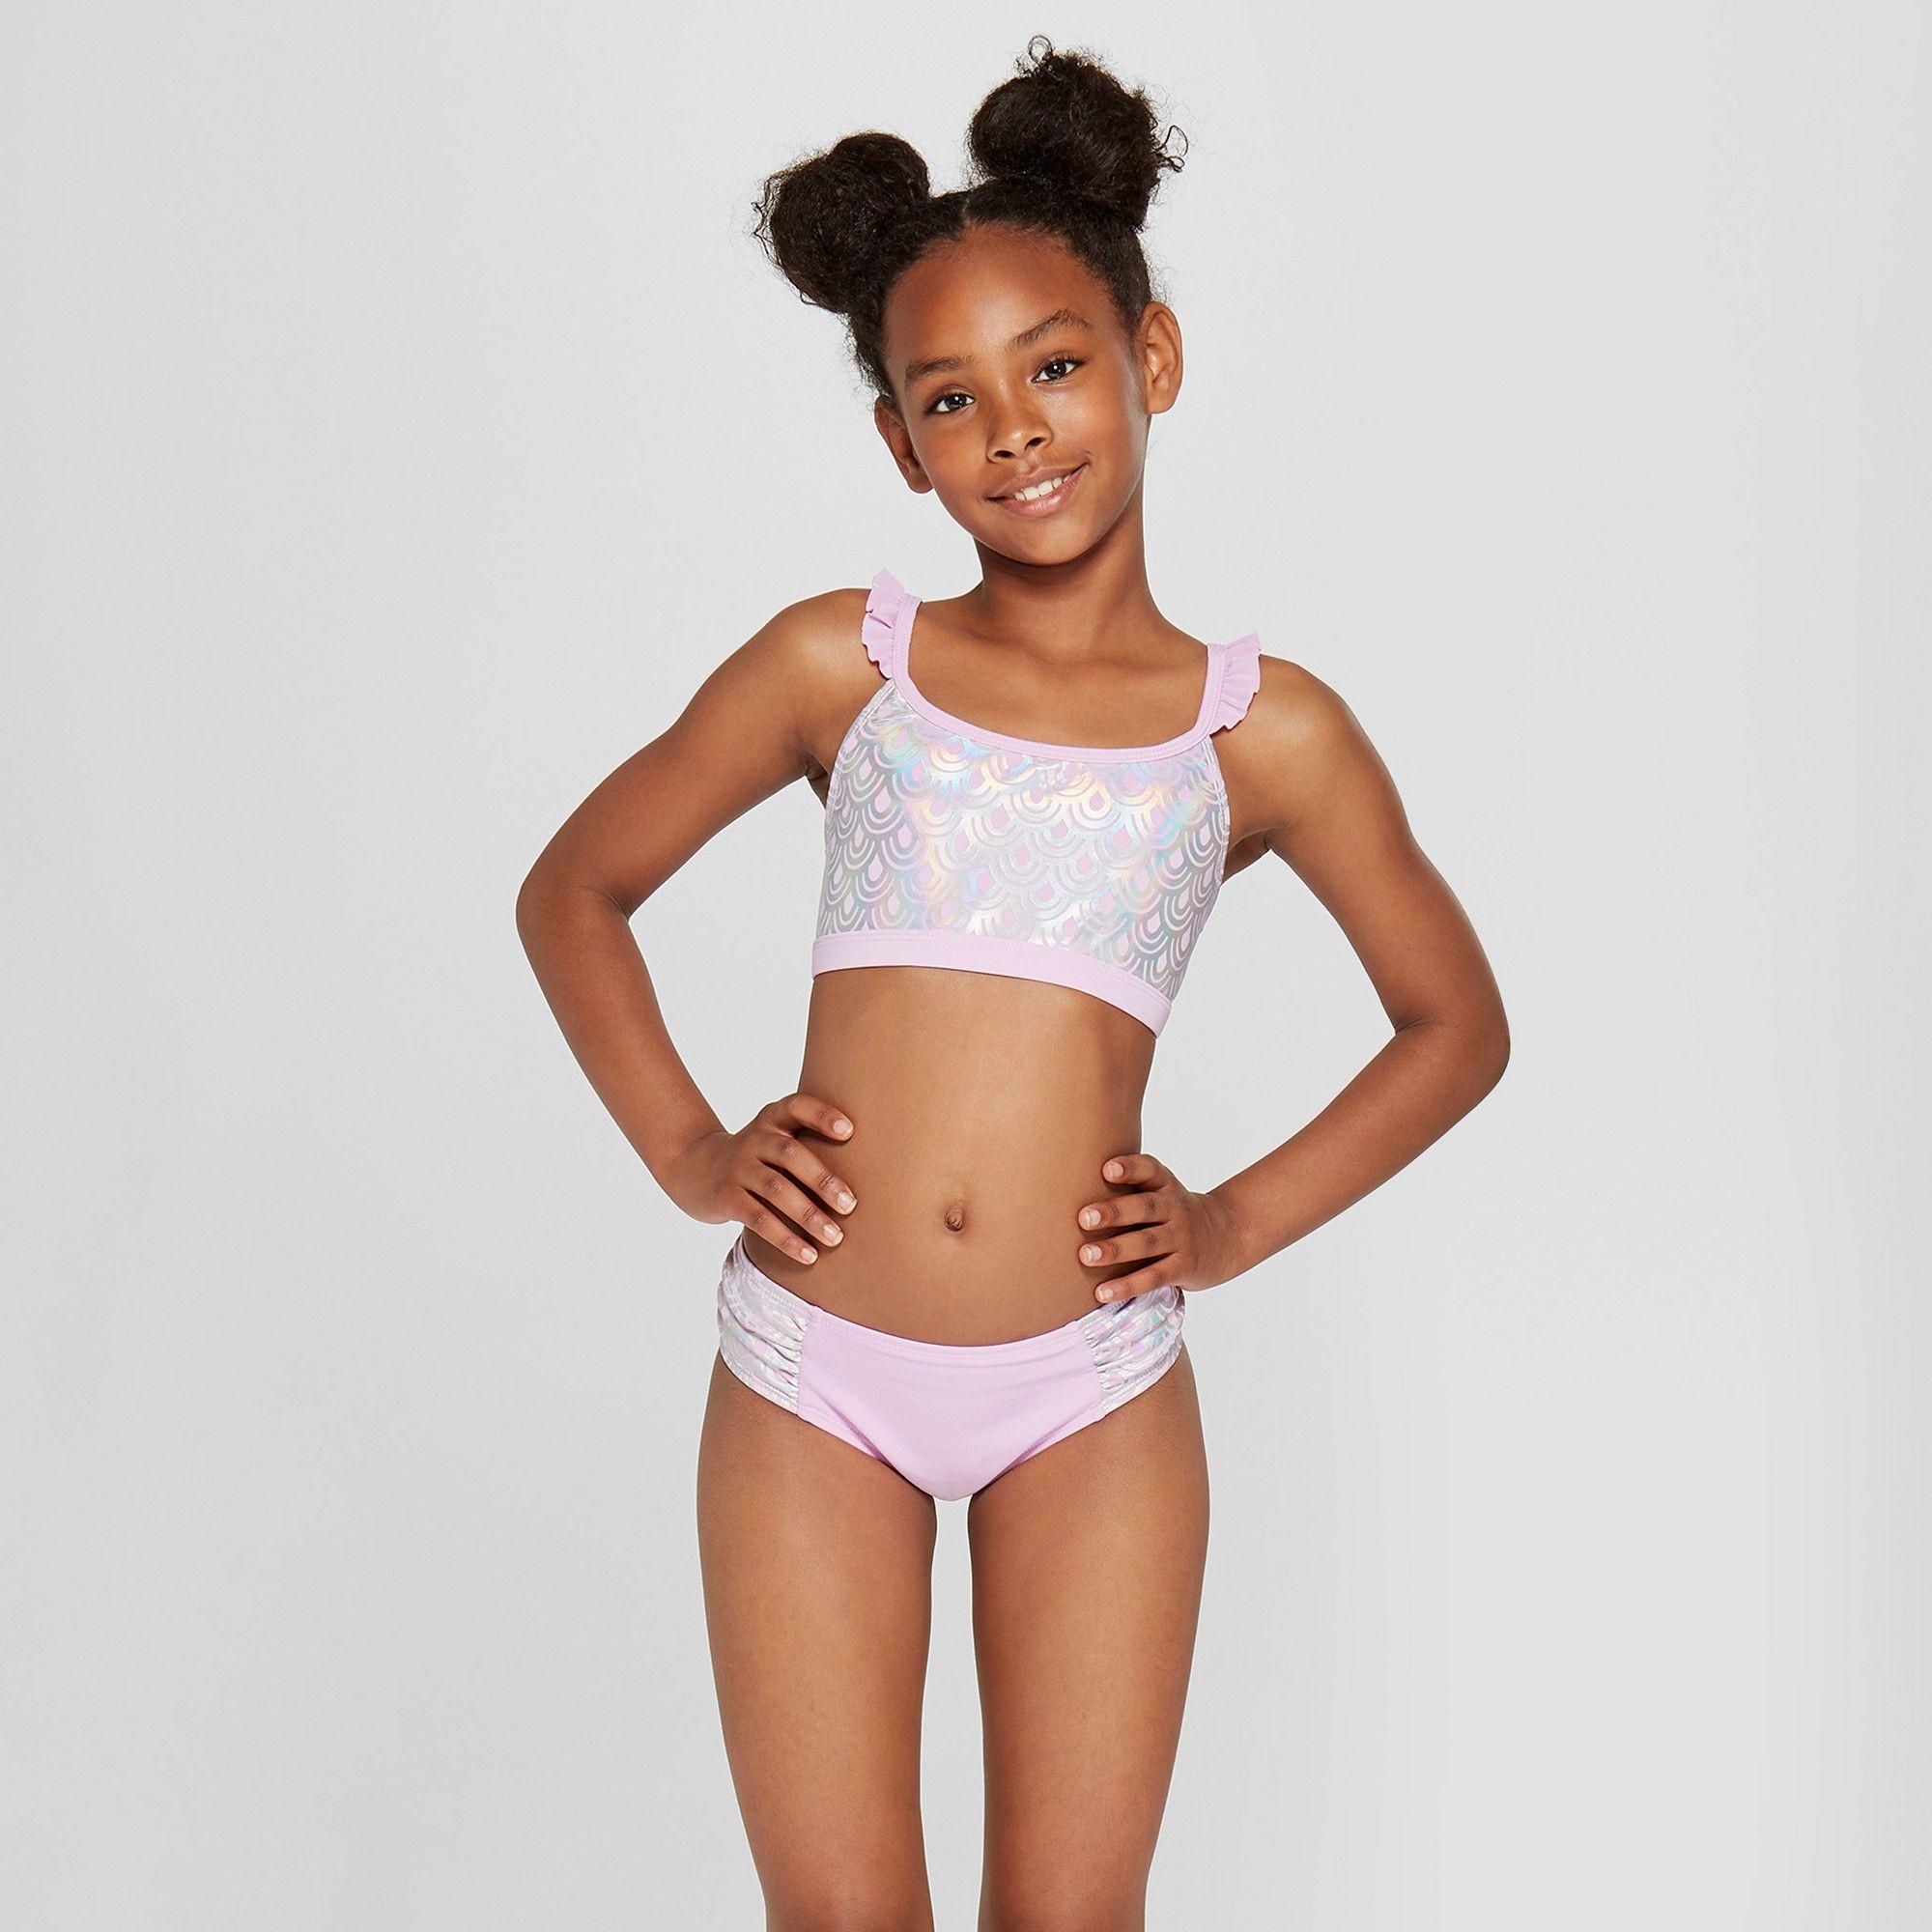 77dcde7281 Girls' Mermaid Bikini Set - Cat & Jack Purple XL | Products in 2019 ...